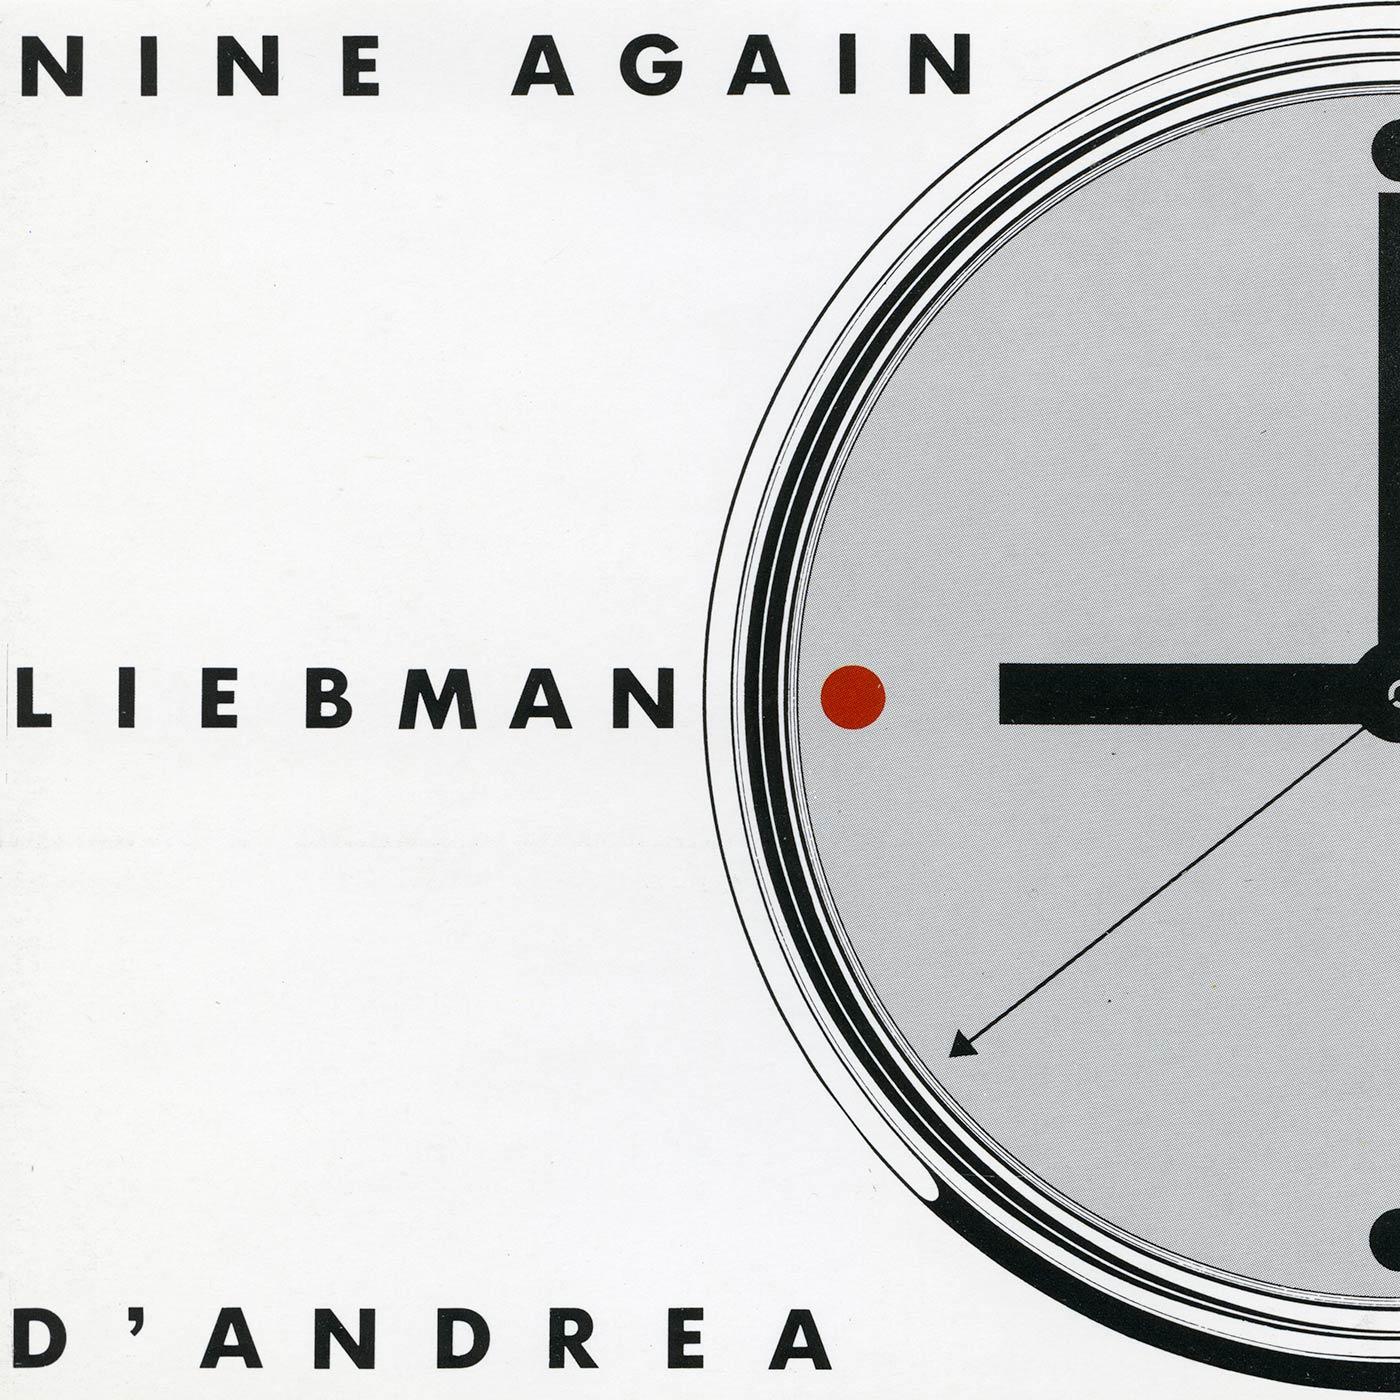 Dave Liebman & Franco D'Andrea